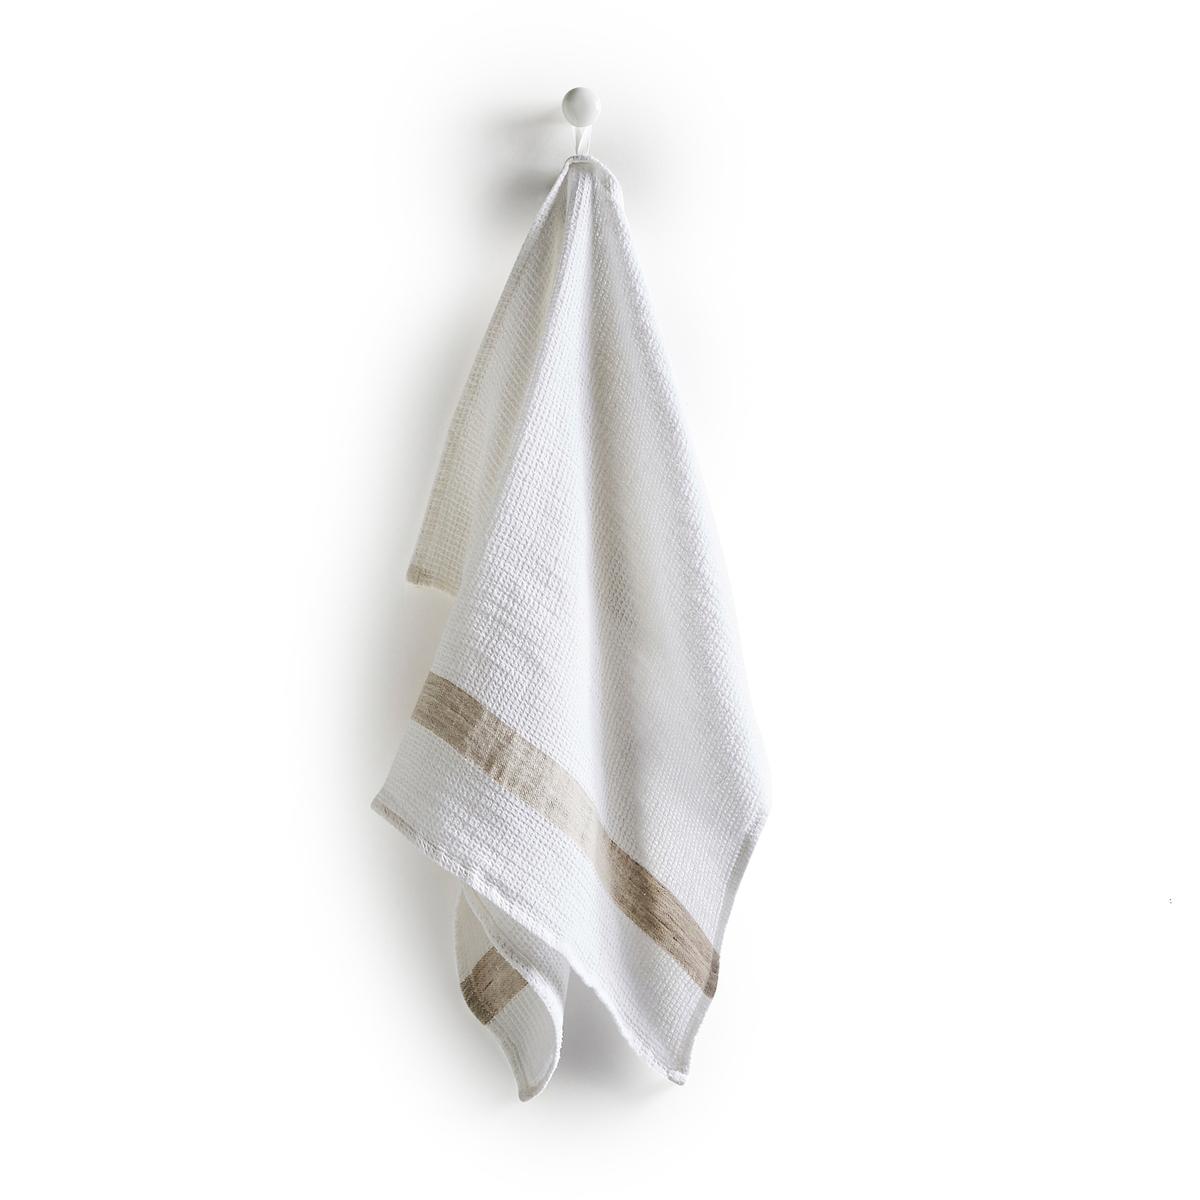 Полотенце из вафельной ткани, 100% лен, Dactyle от La Redoute